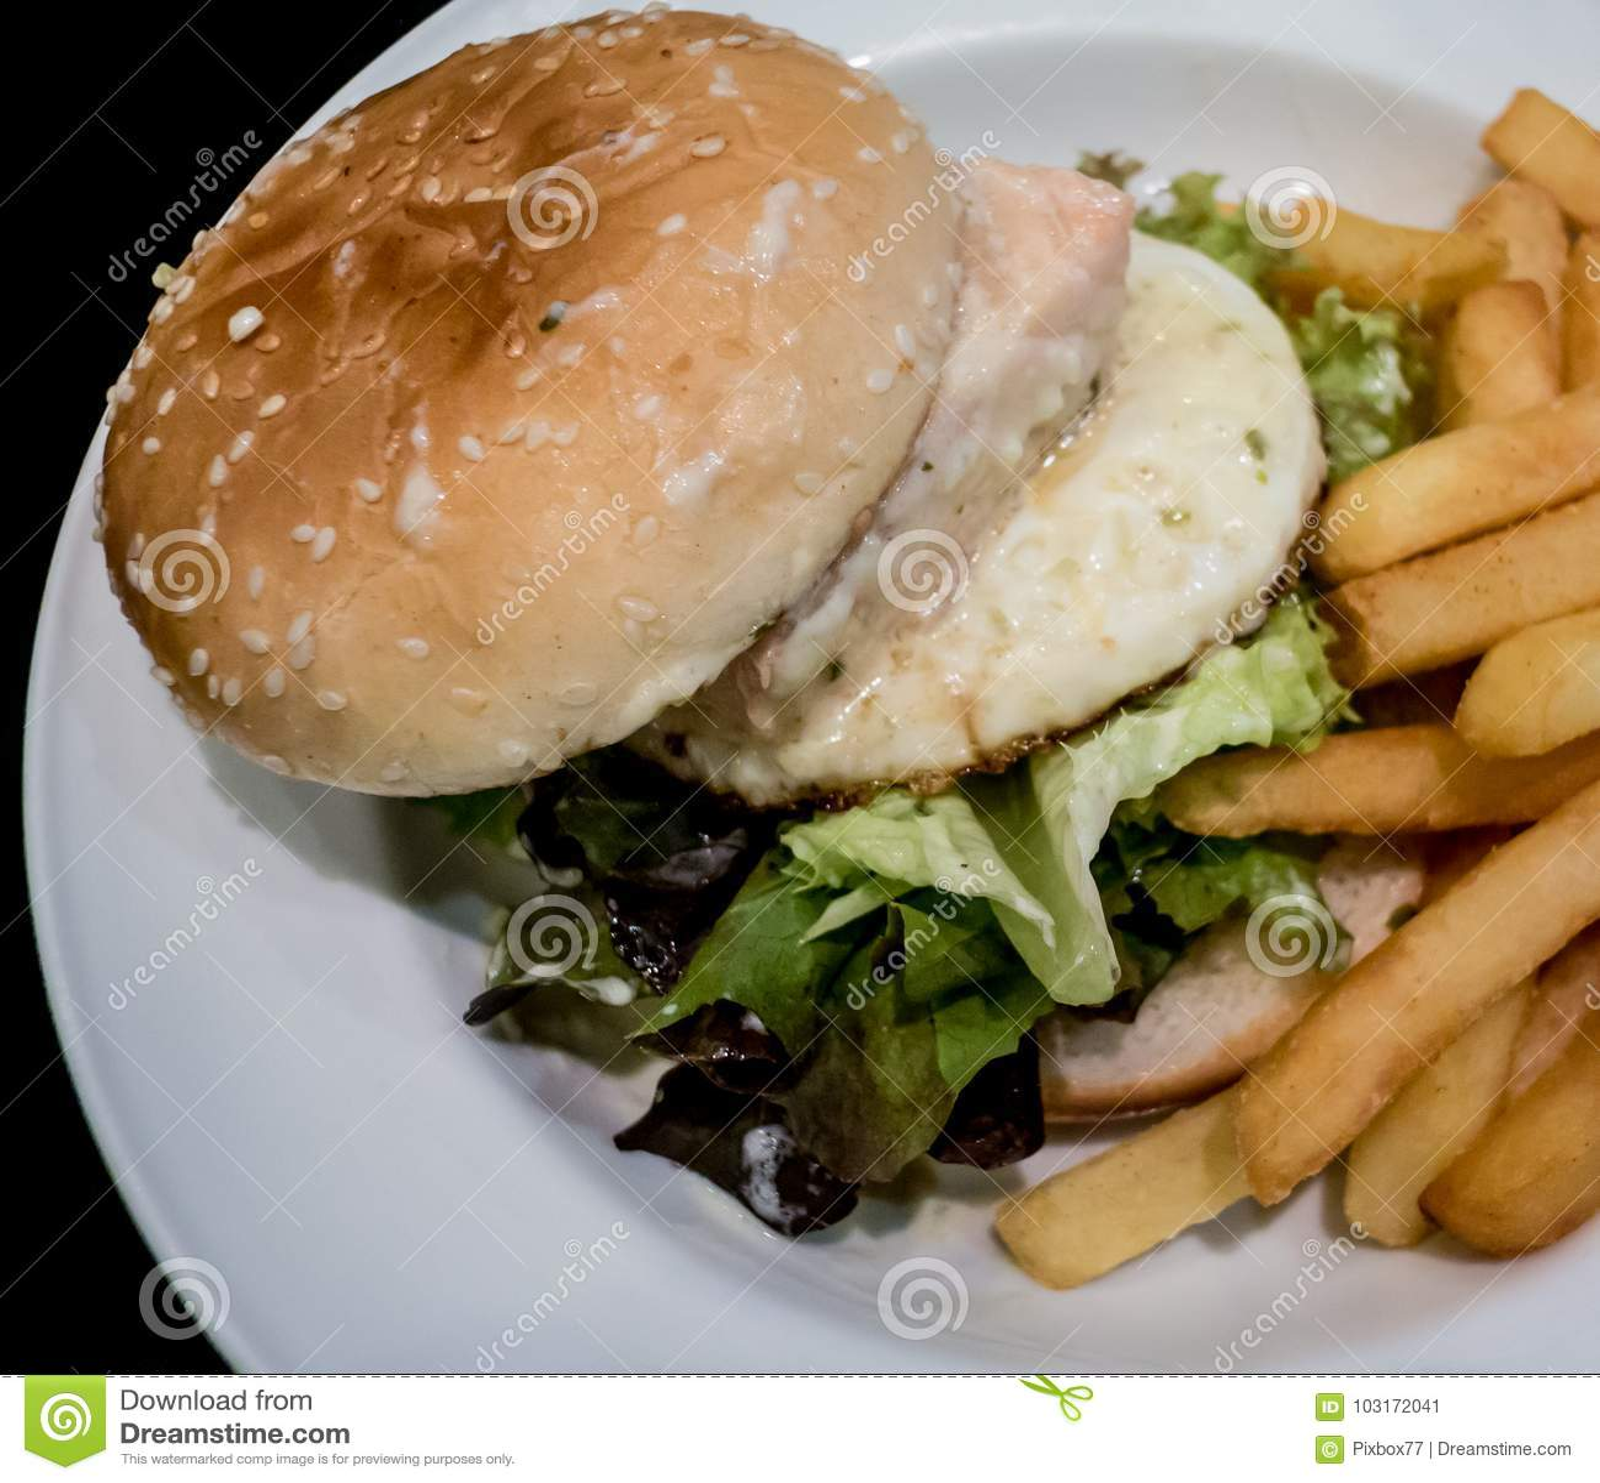 Hamburger with deep fried potato